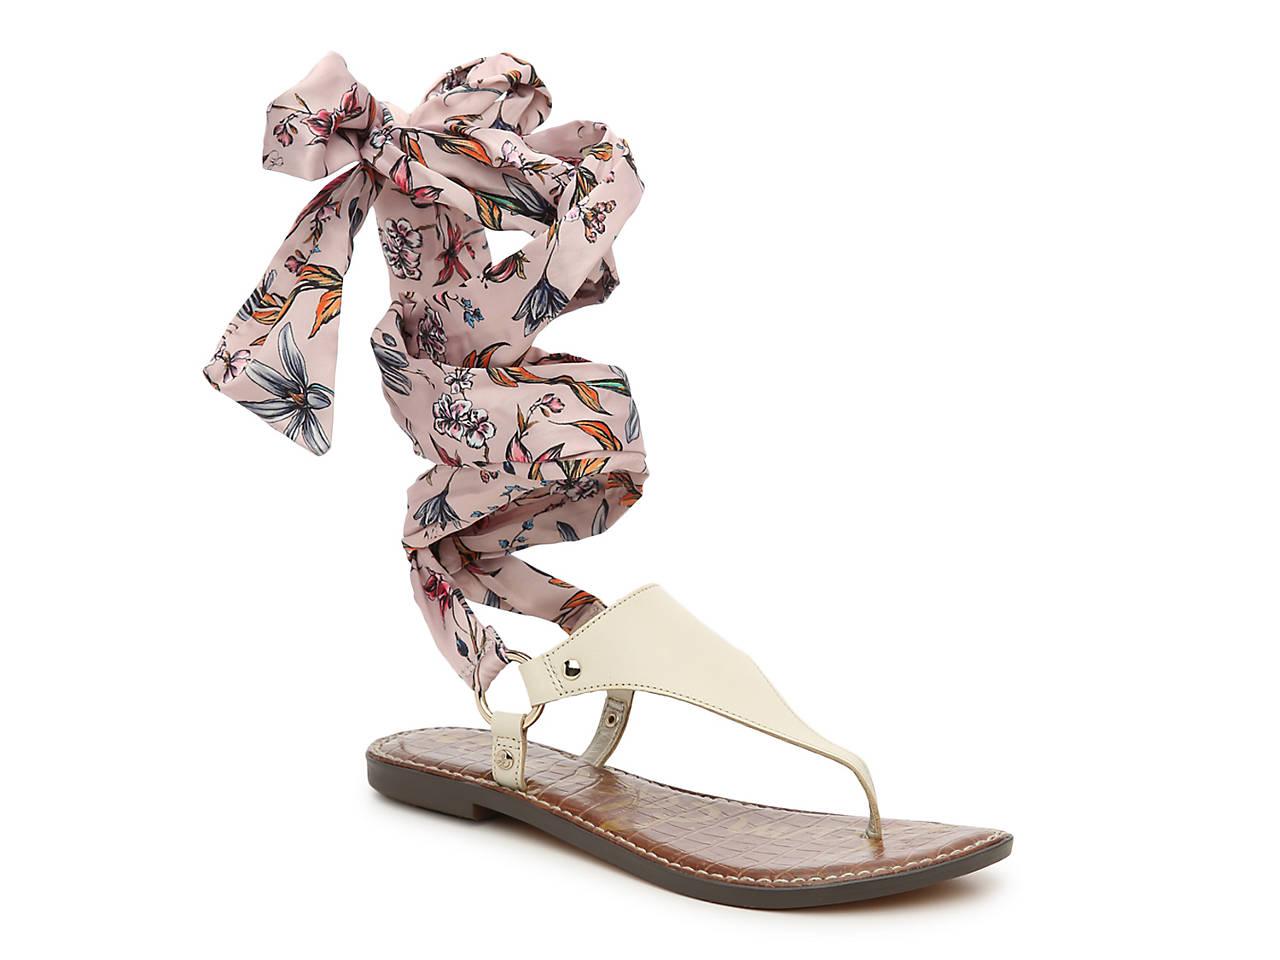 86100c26e40c Sam Edelman Giliana Sandal Women s Shoes